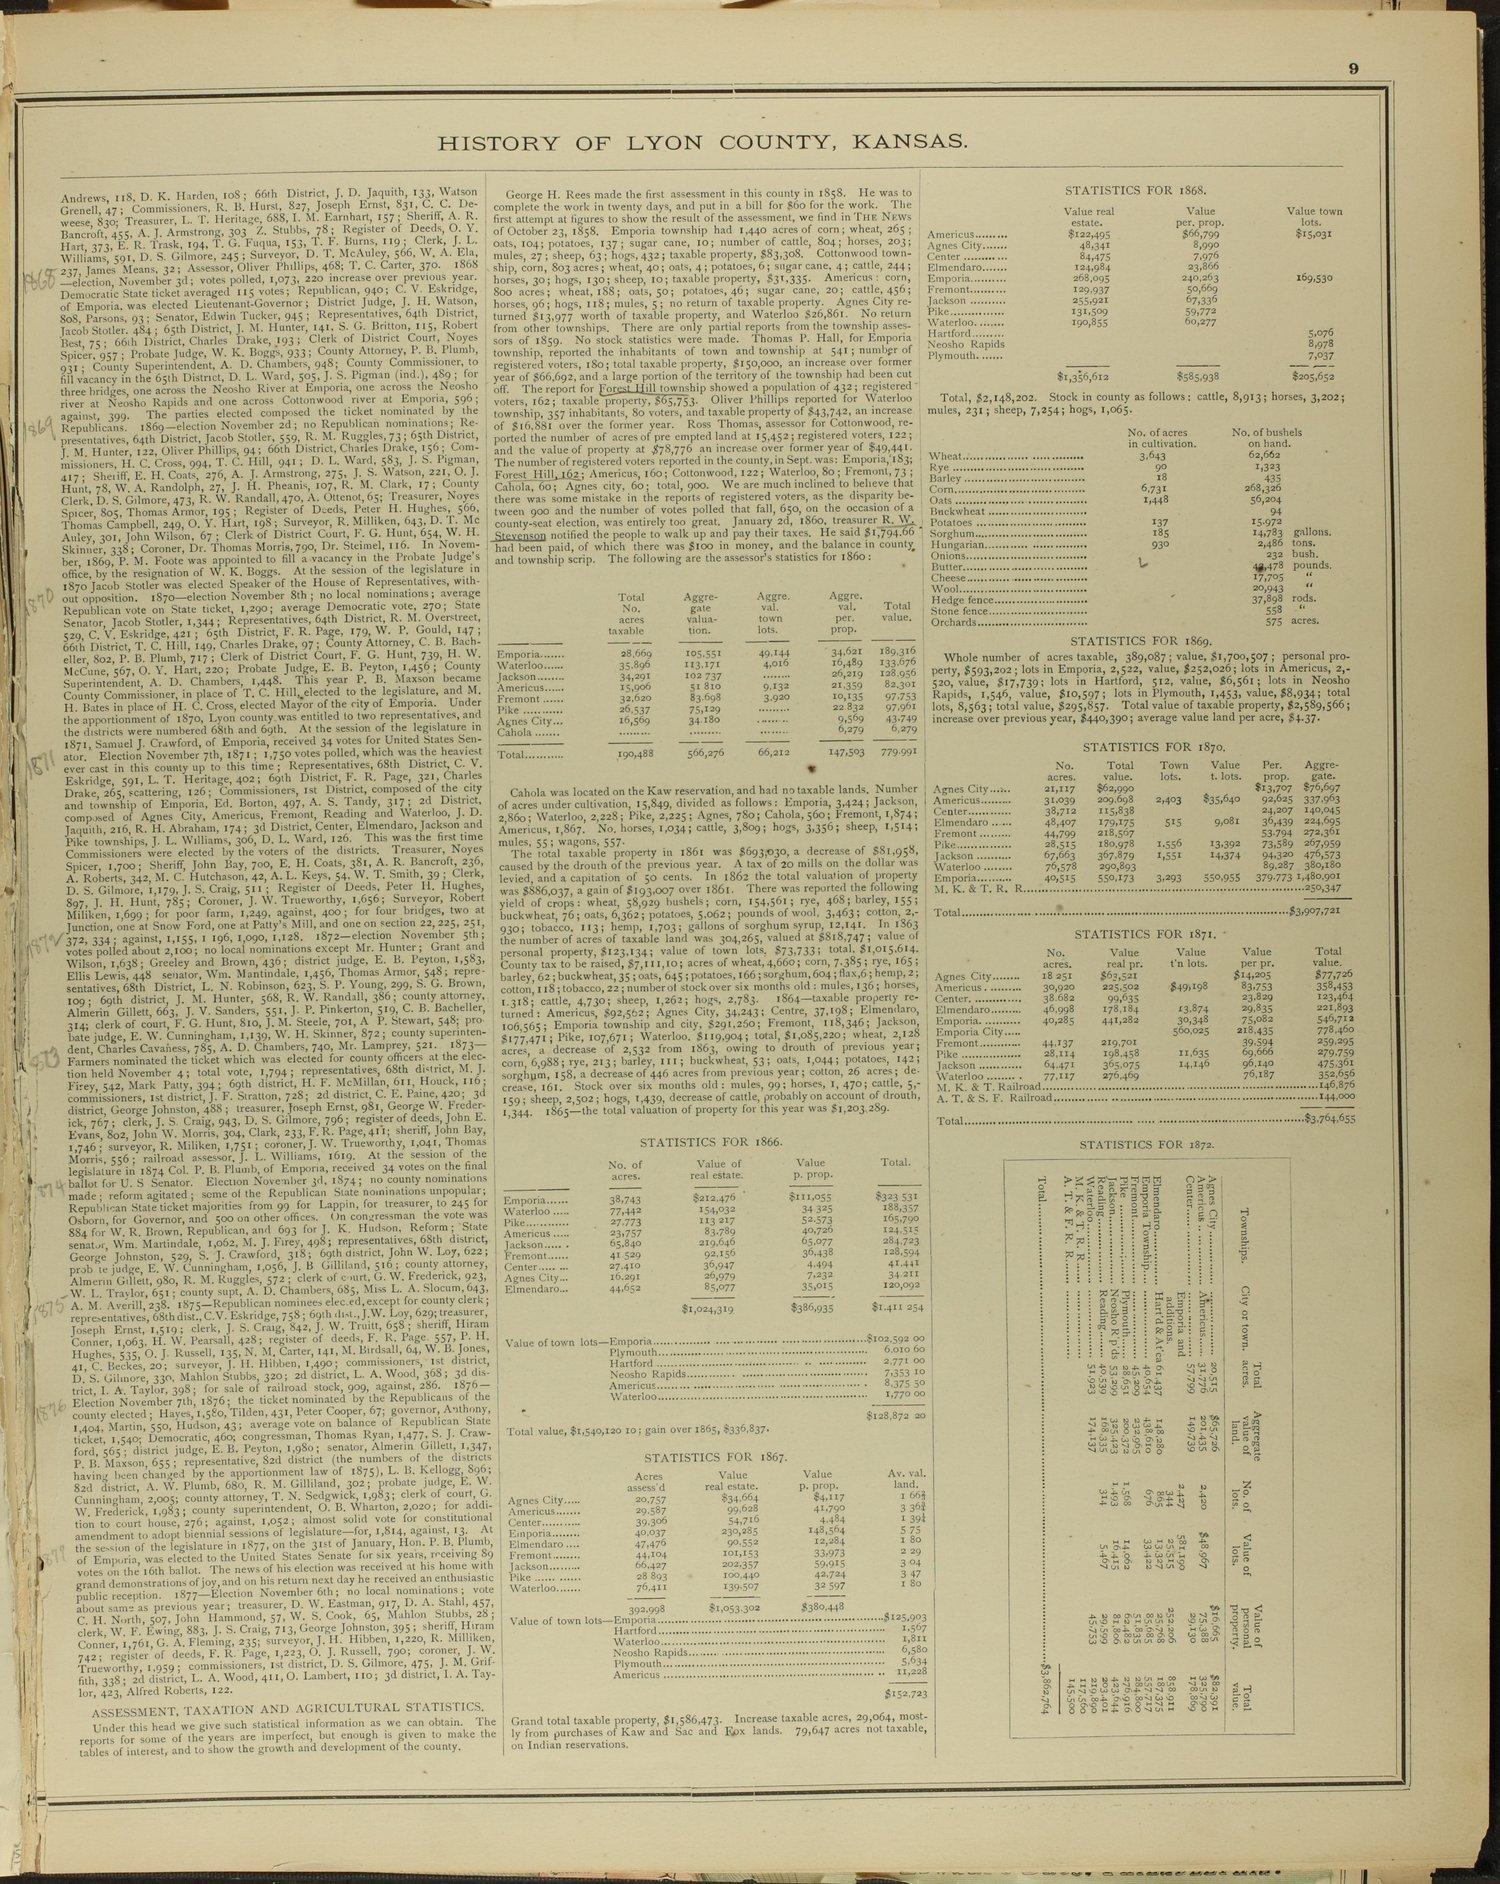 An illustrated historical atlas of Lyon county, Kansas - 9